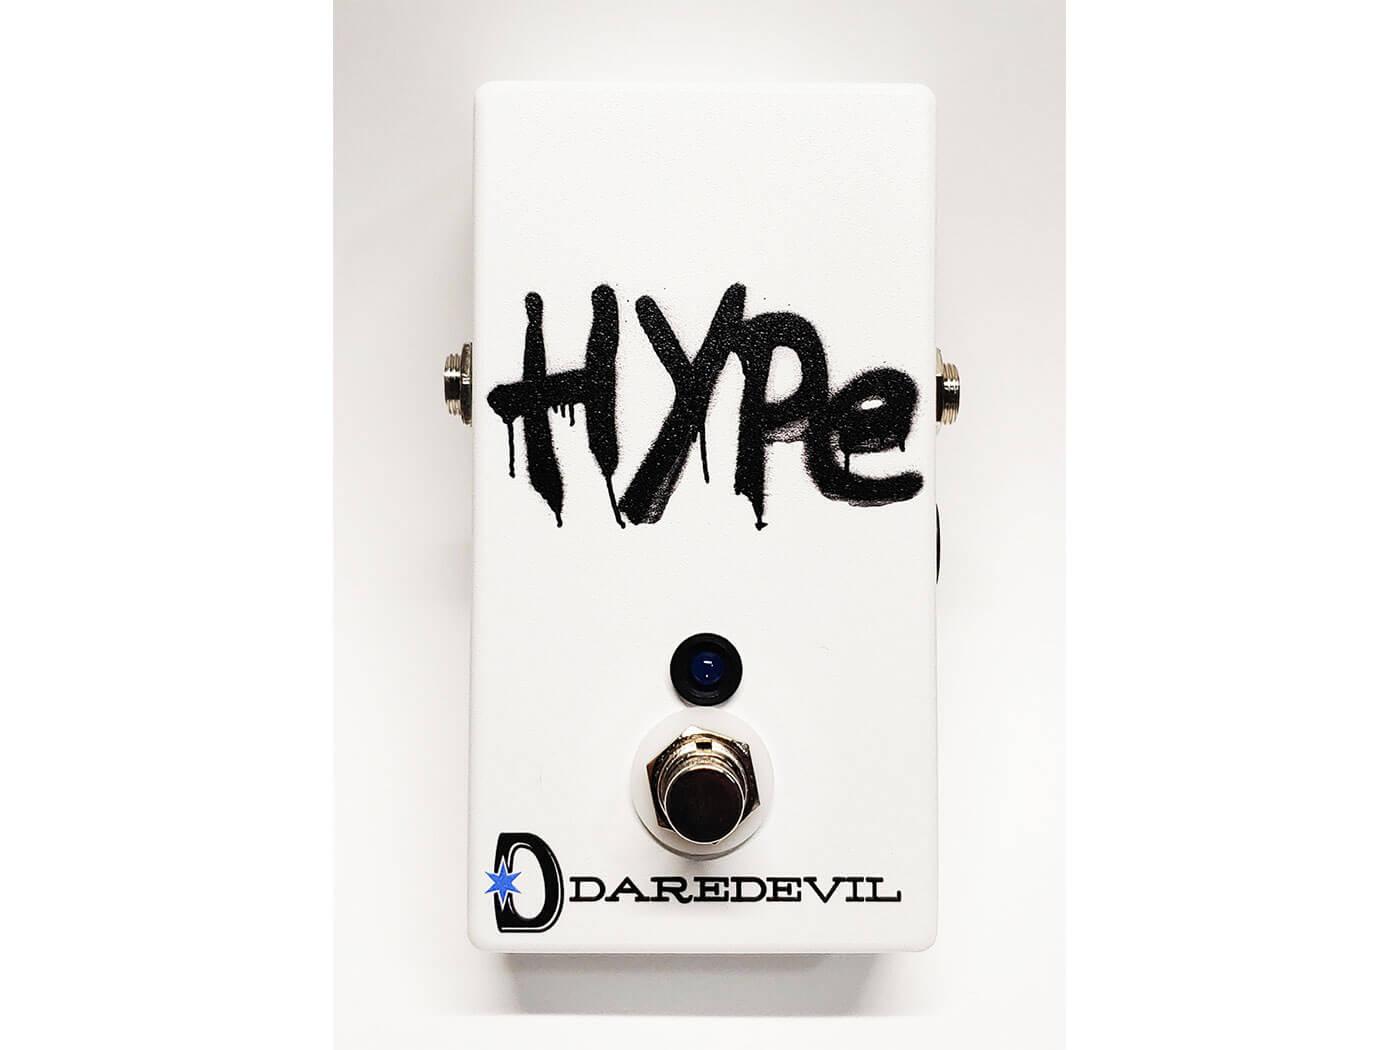 The Daredevil Hype